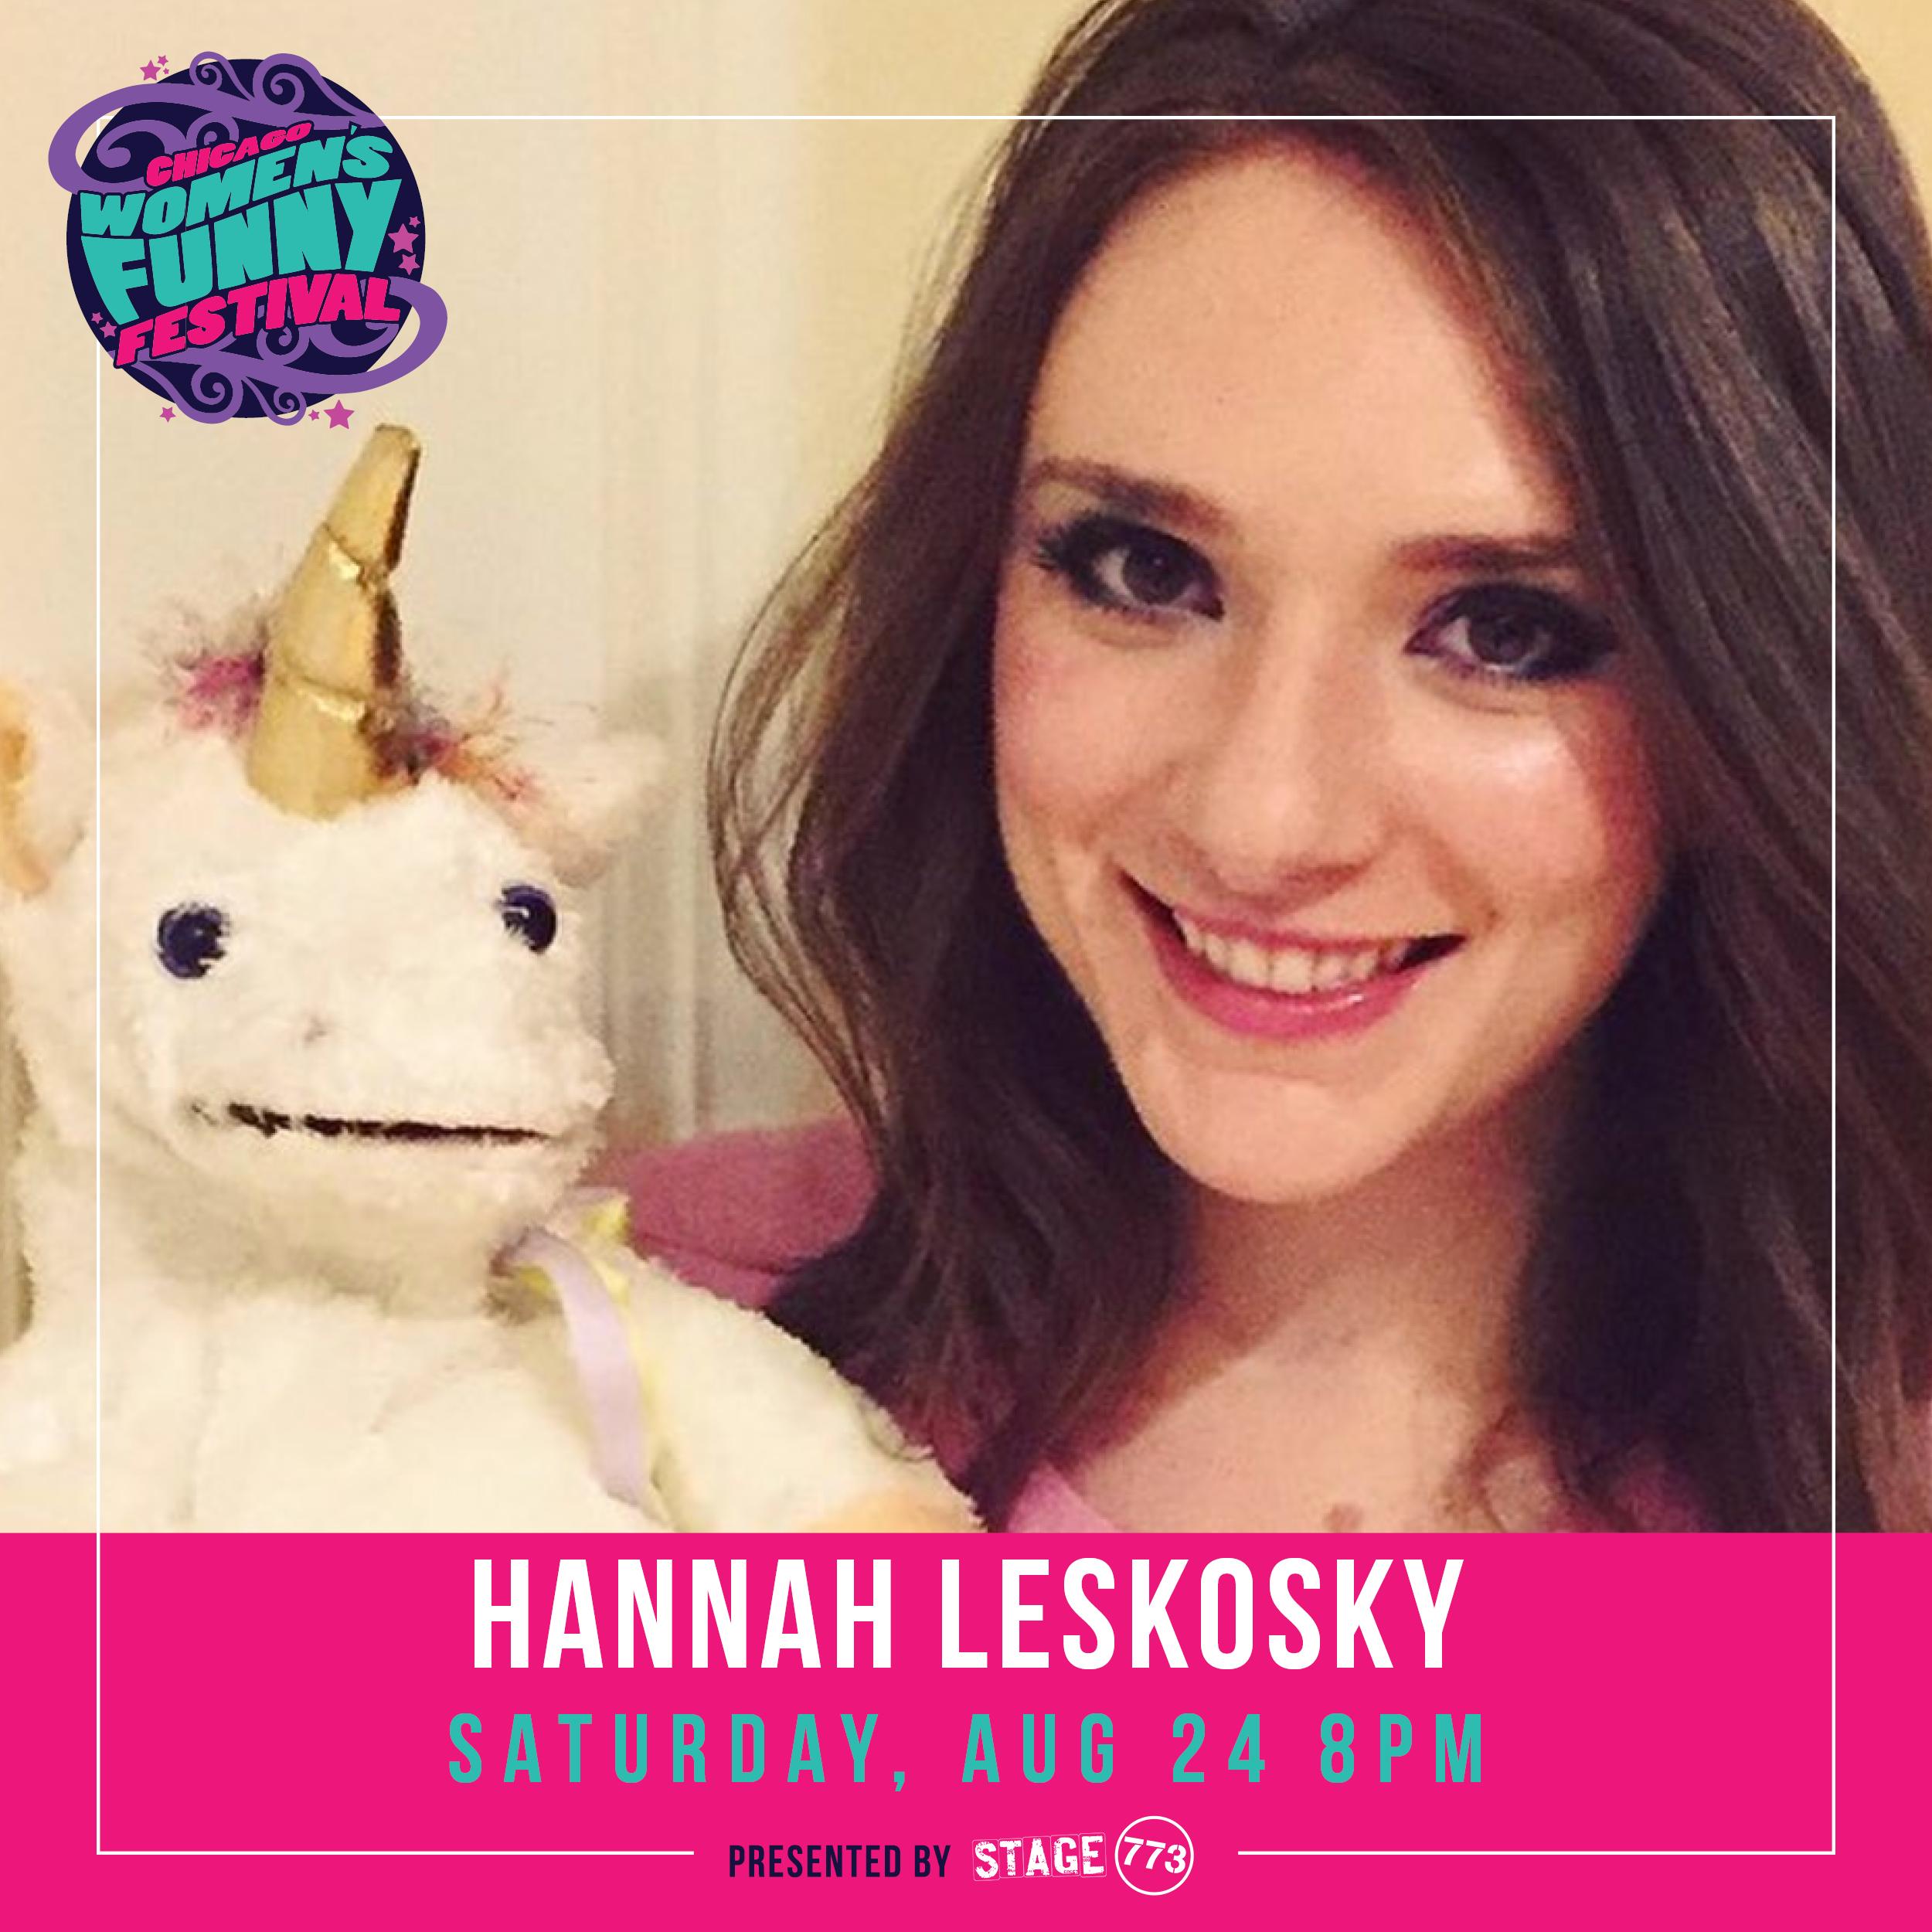 HannahLeskosky_Saturday_8PM_CWFF20193.jpg